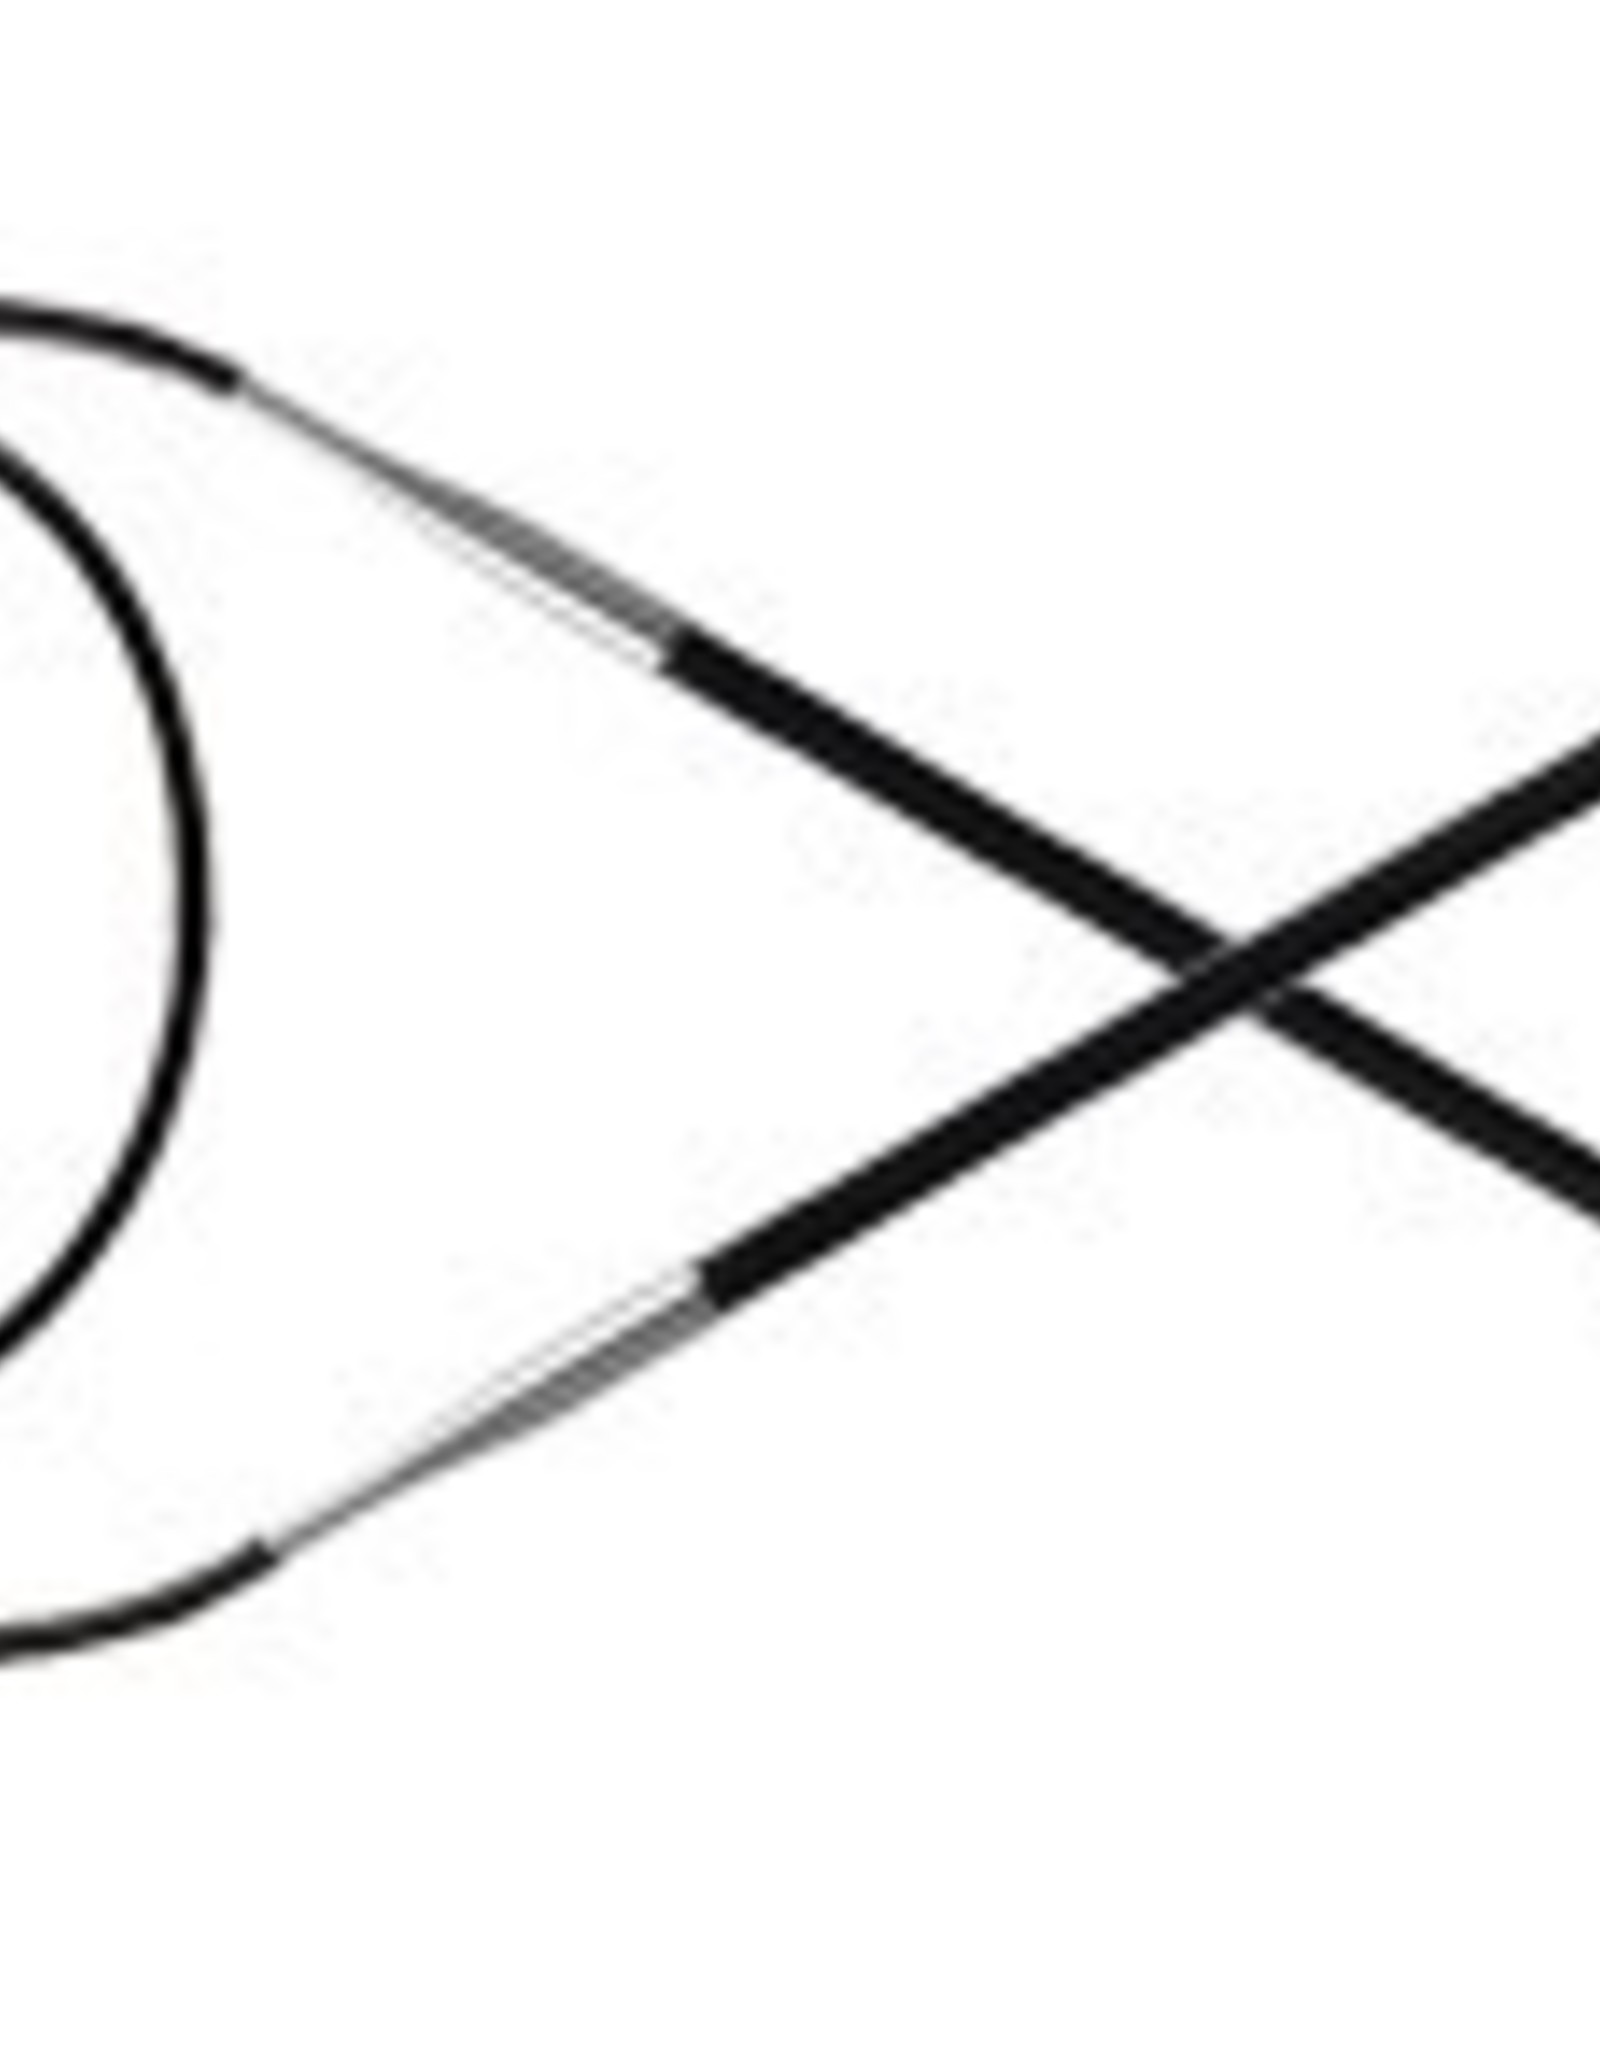 Knitter's Pride 8 Karbonz Circular 16